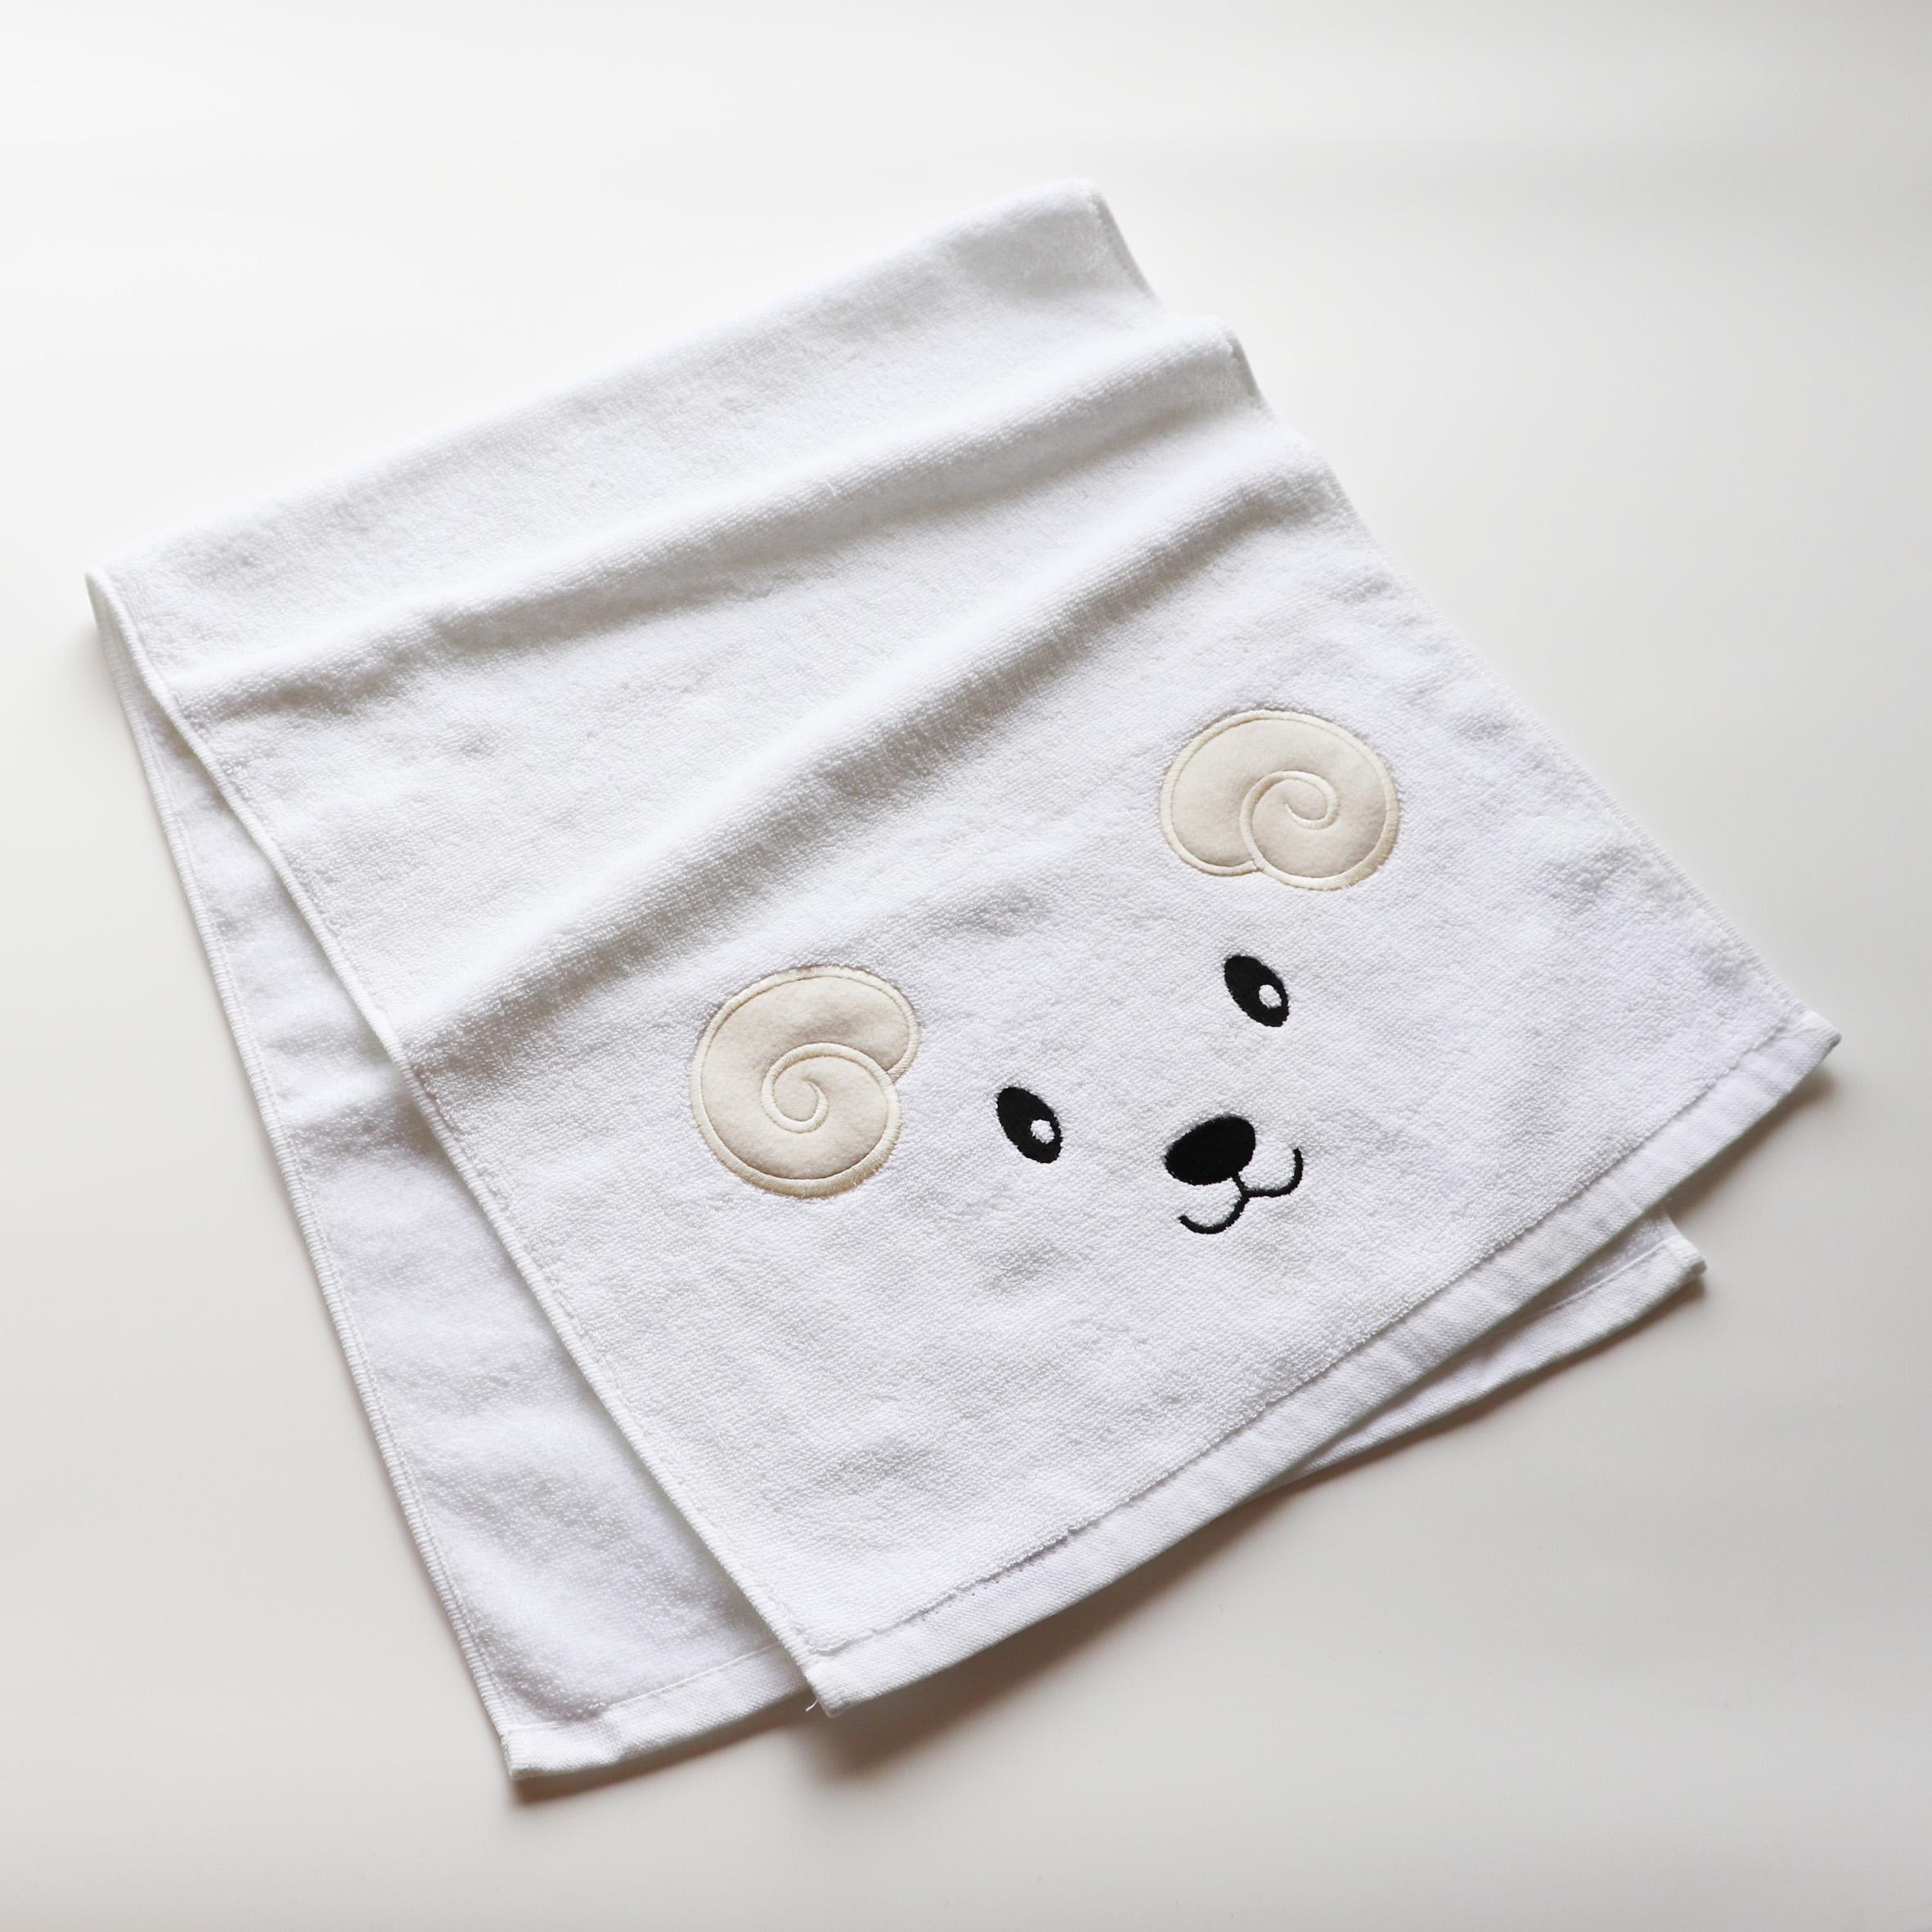 【062701】<br>オリジナル刺繍/A位置<br>AI<br>フェイスタオル<br>ホワイト